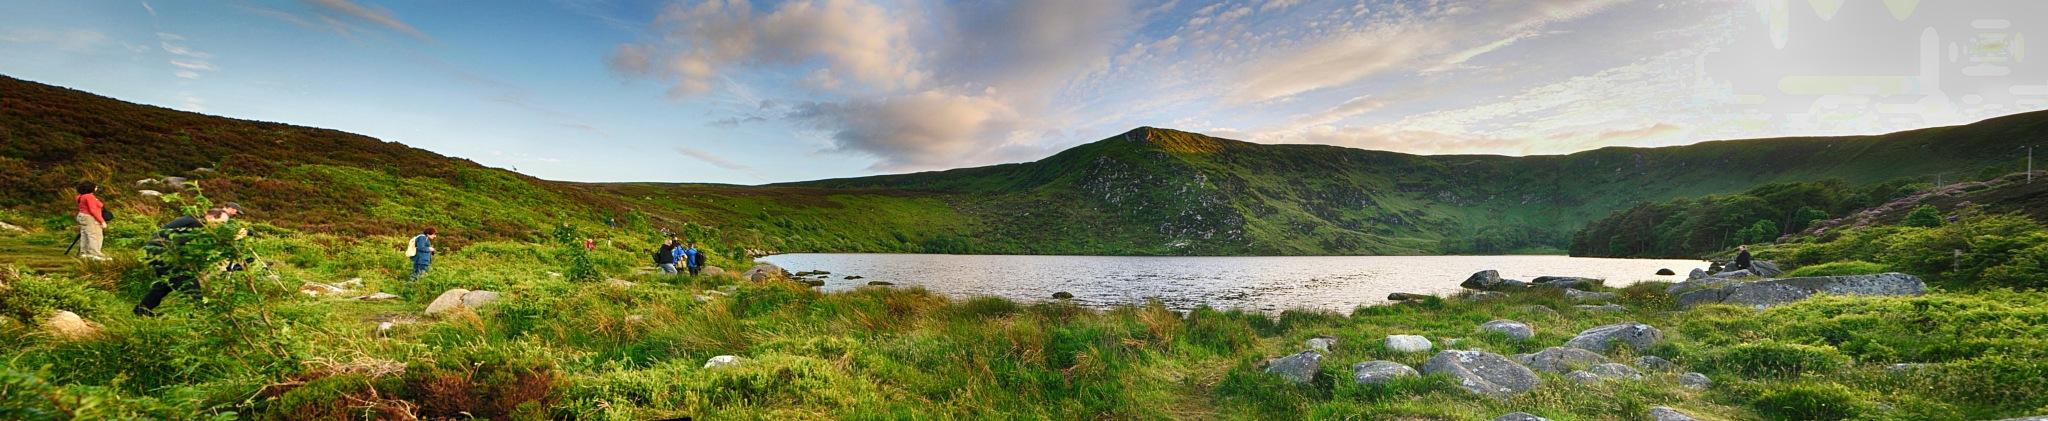 Panorama (61) - TPS Outing - Glencree (June 2013) (12) by Derek Clarke